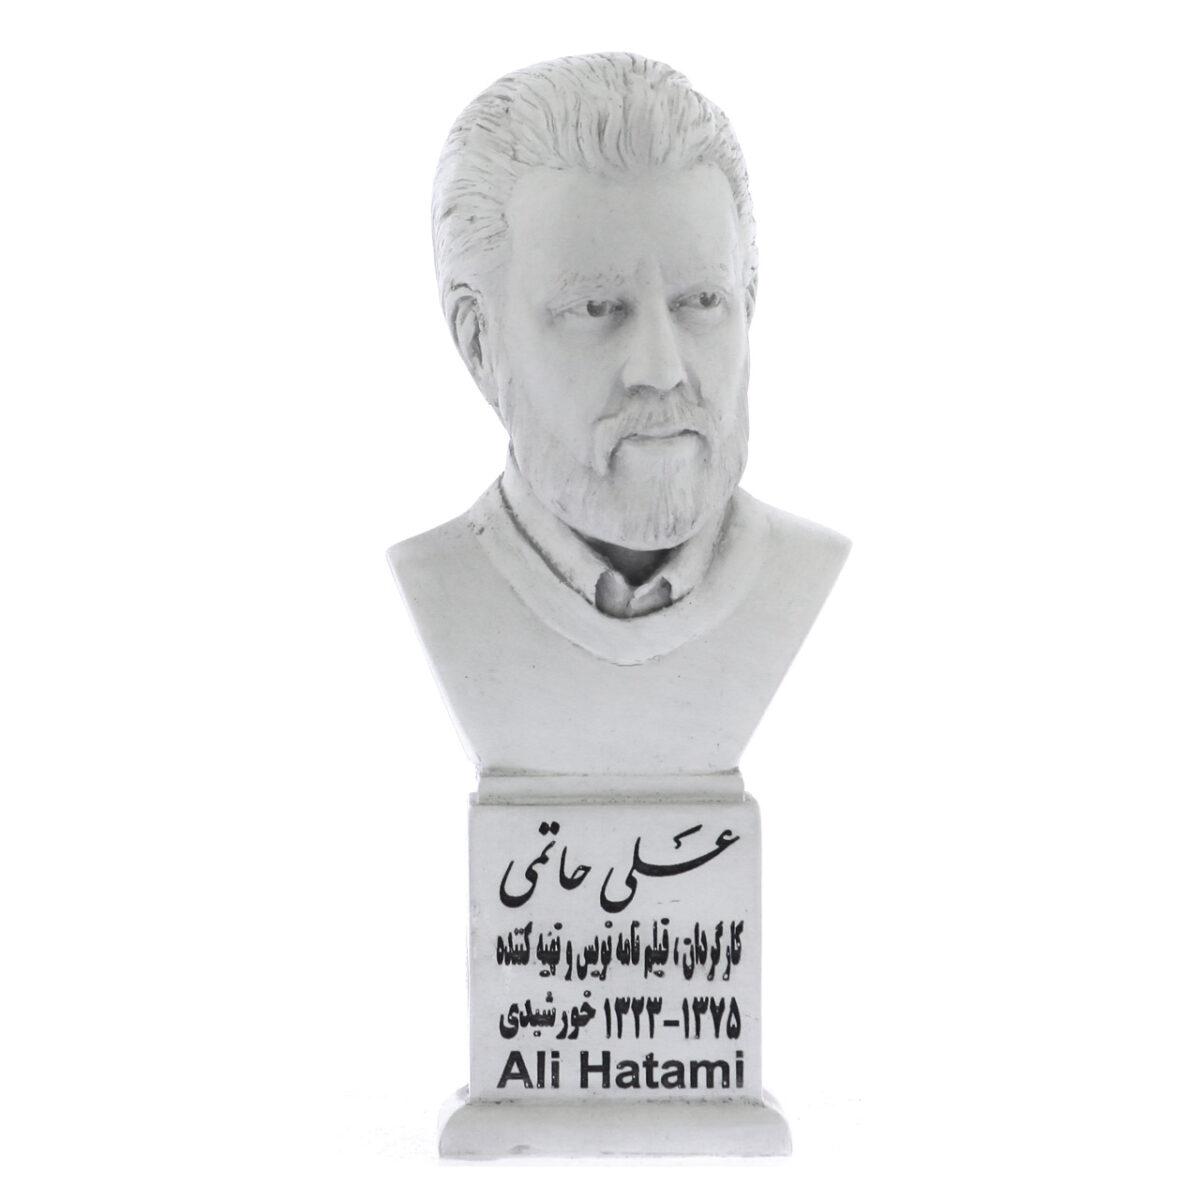 ali hatami s 1200x1200 - سردیس علی حاتمی